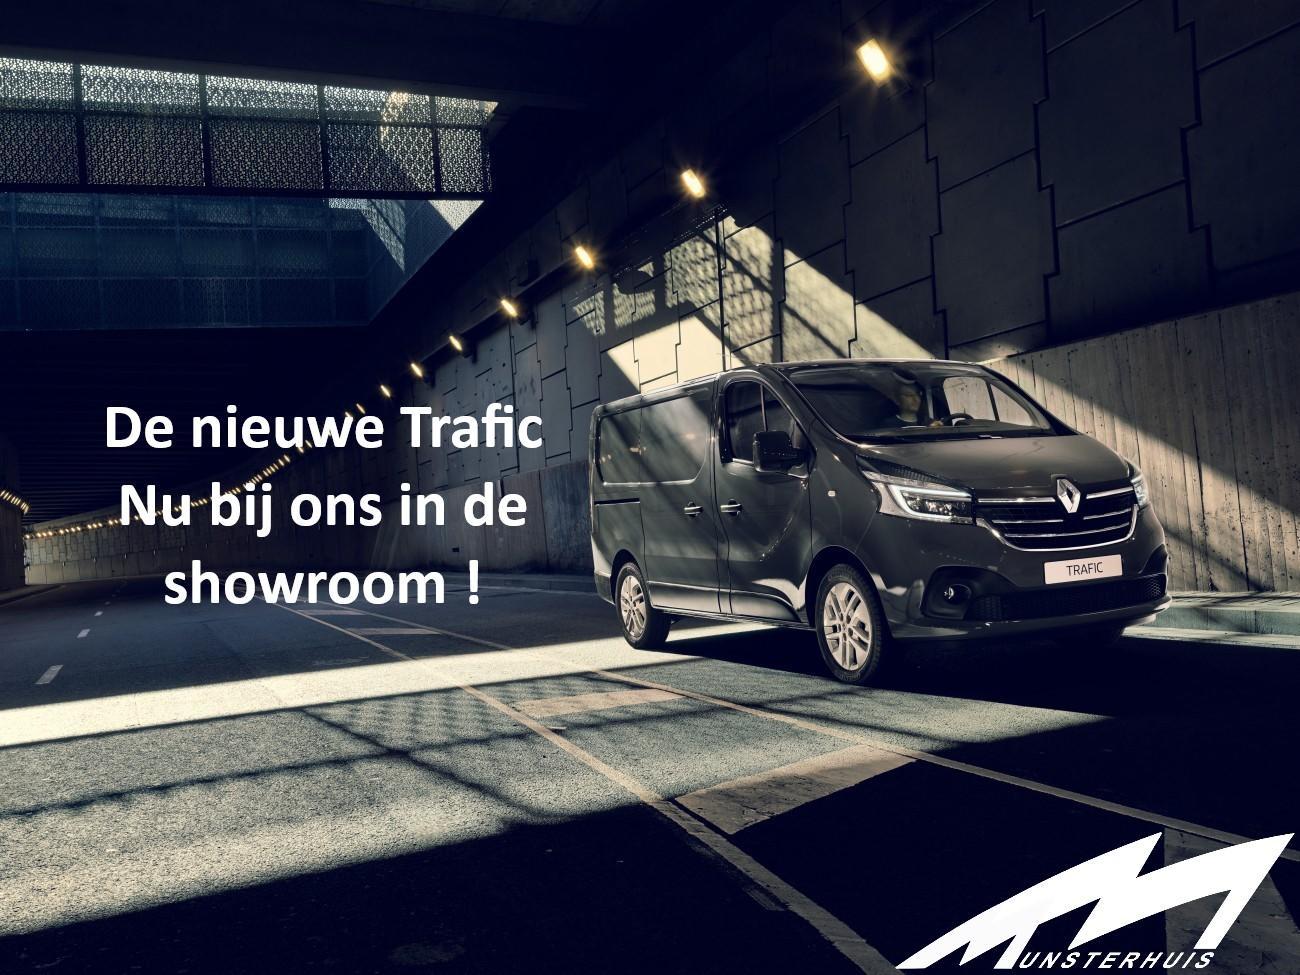 Renault Trafic L2h1 t29 dc energy dci 145 edc luxe - nieuw - automaat